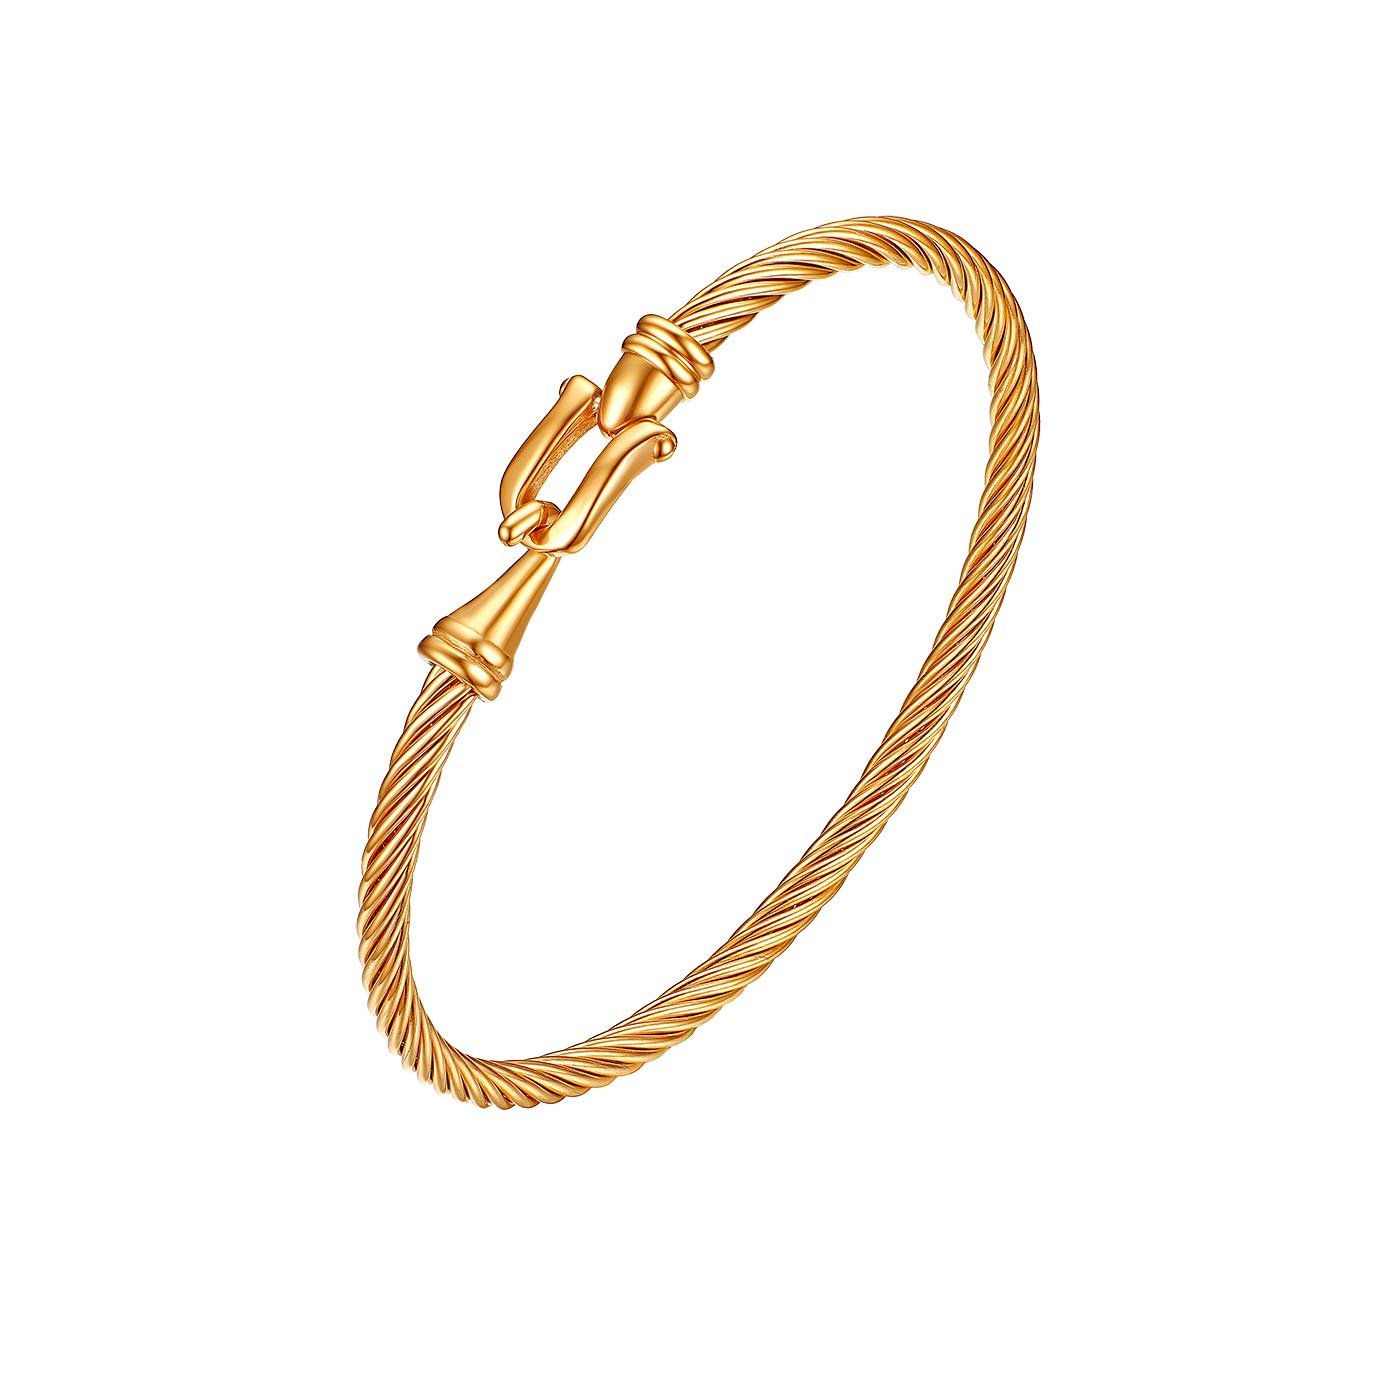 Womens Girls Twisted Cable Bangle Bracelet with Hook Clasp Flongo Cable Bangle Bracelet Cable Chain Cuff Bracelet Anklet Valentine Wedding Engagement Wrist Bracelet